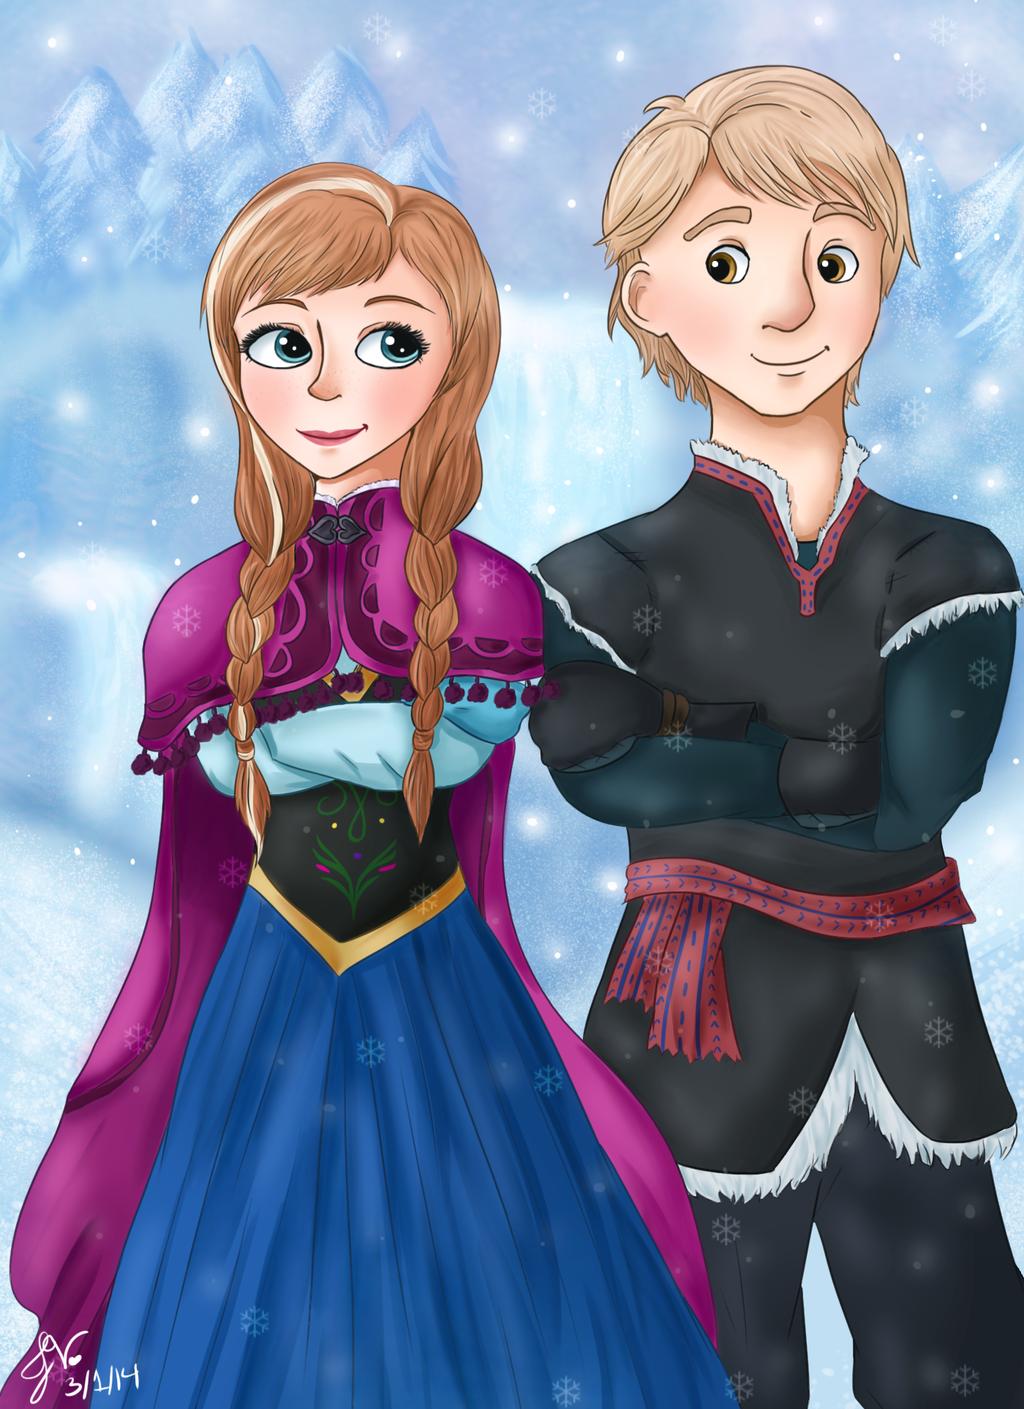 Wallpaper Olafs Frozen Adventure Anna Elsa Olaf